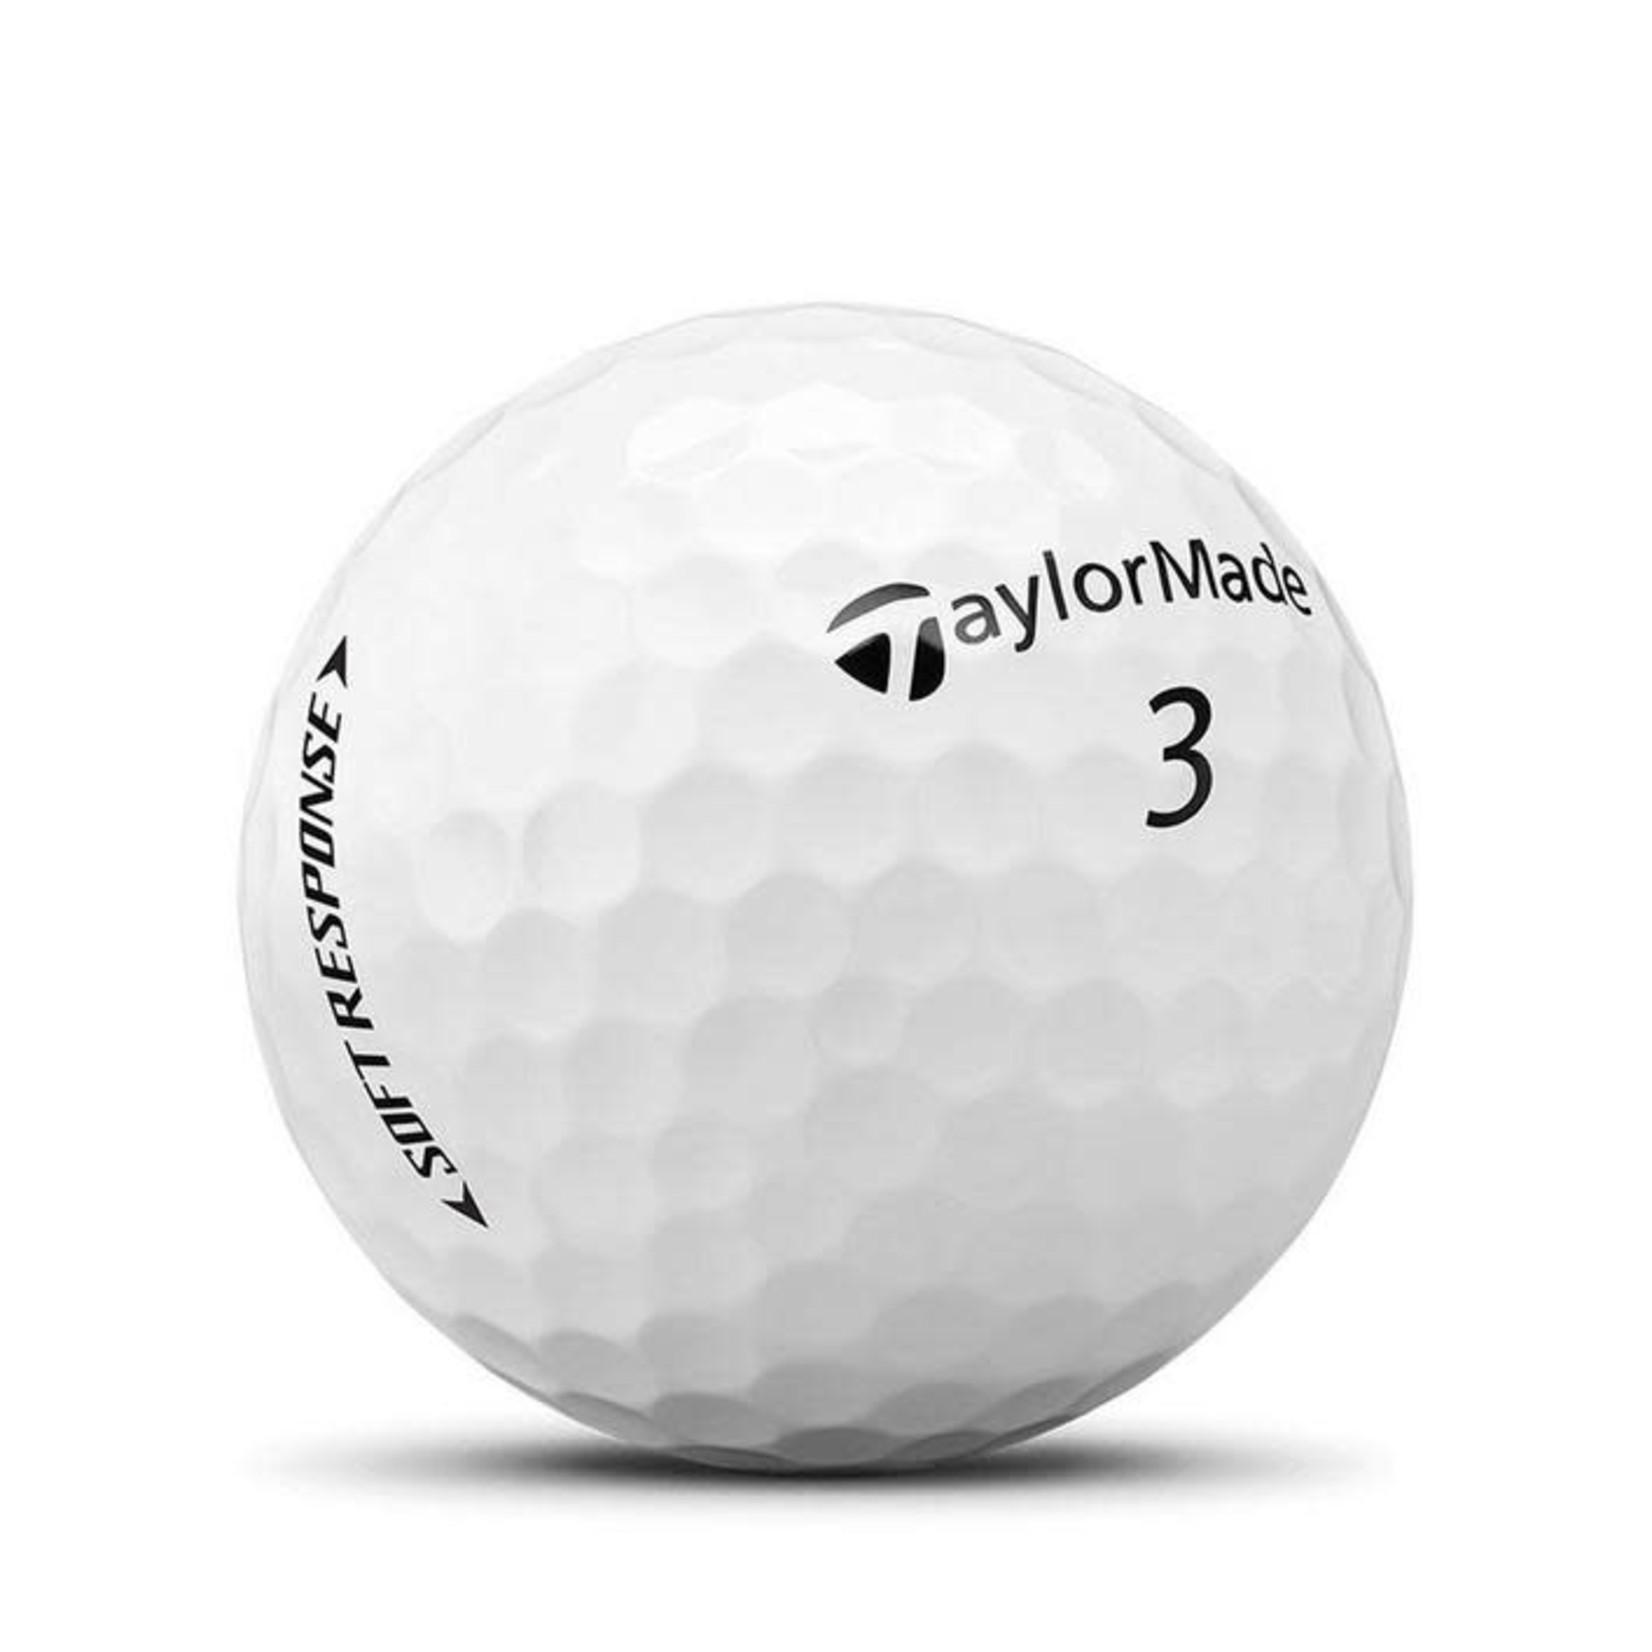 TaylorMade Soft Response - Dozen